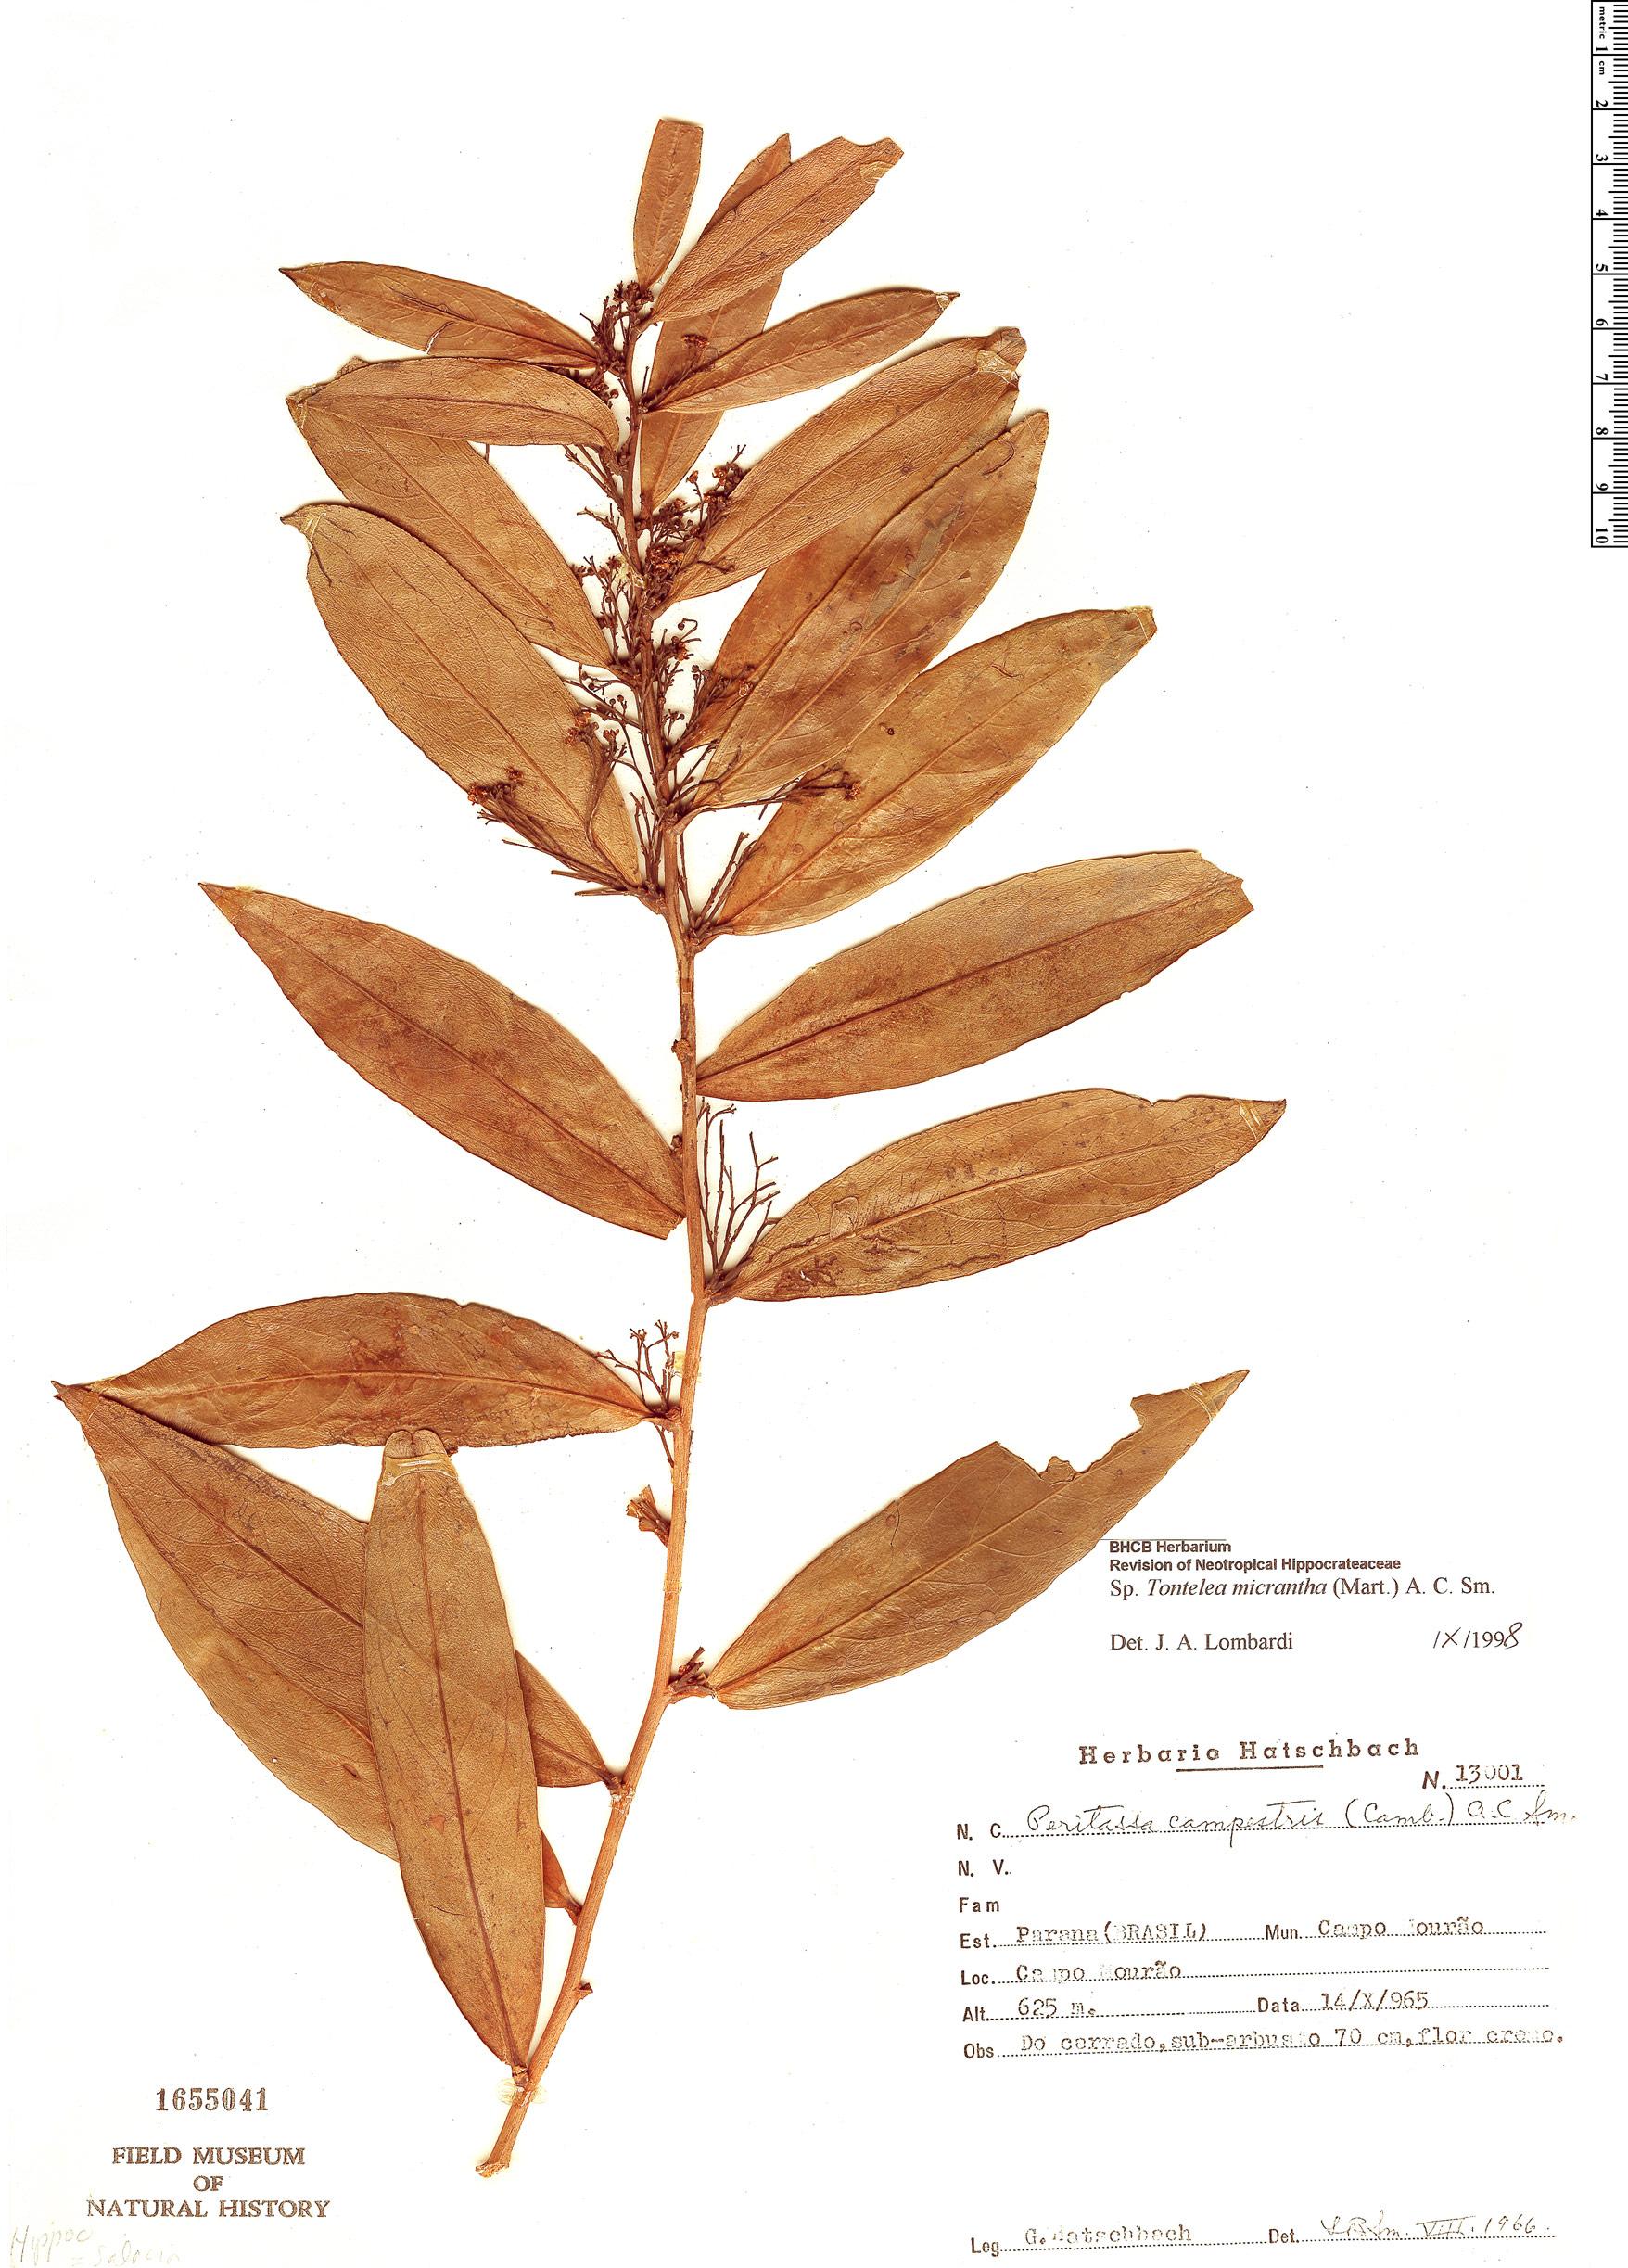 Specimen: Tontelea micrantha